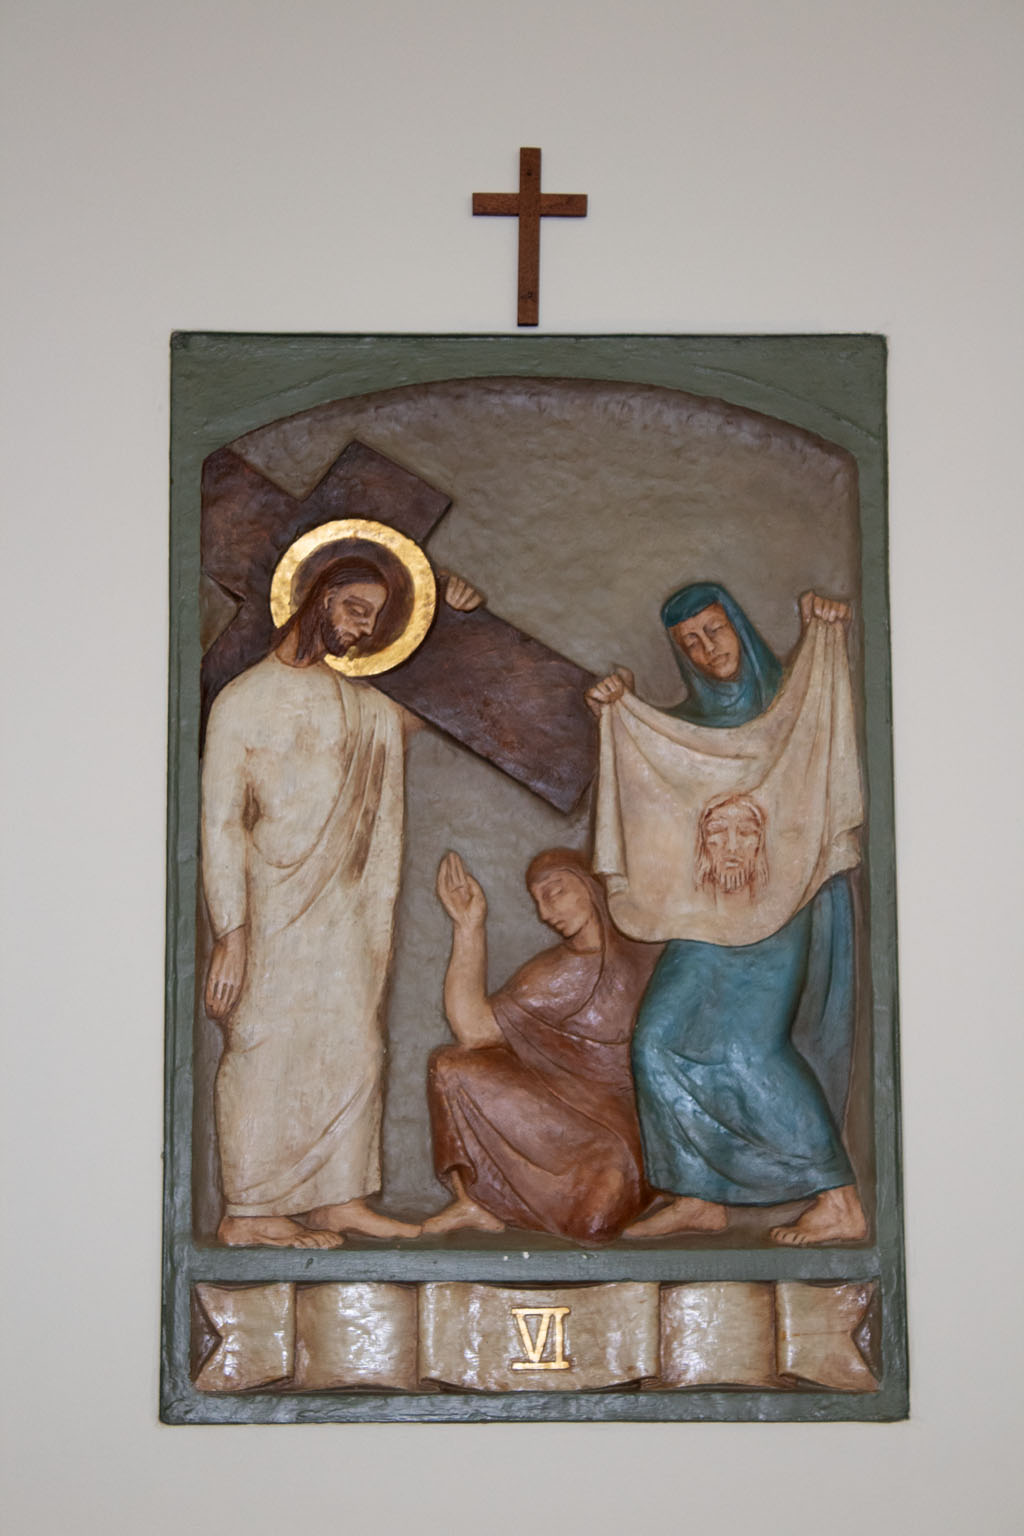 Sixth Station of the cross by Dora de Pédery Hunt